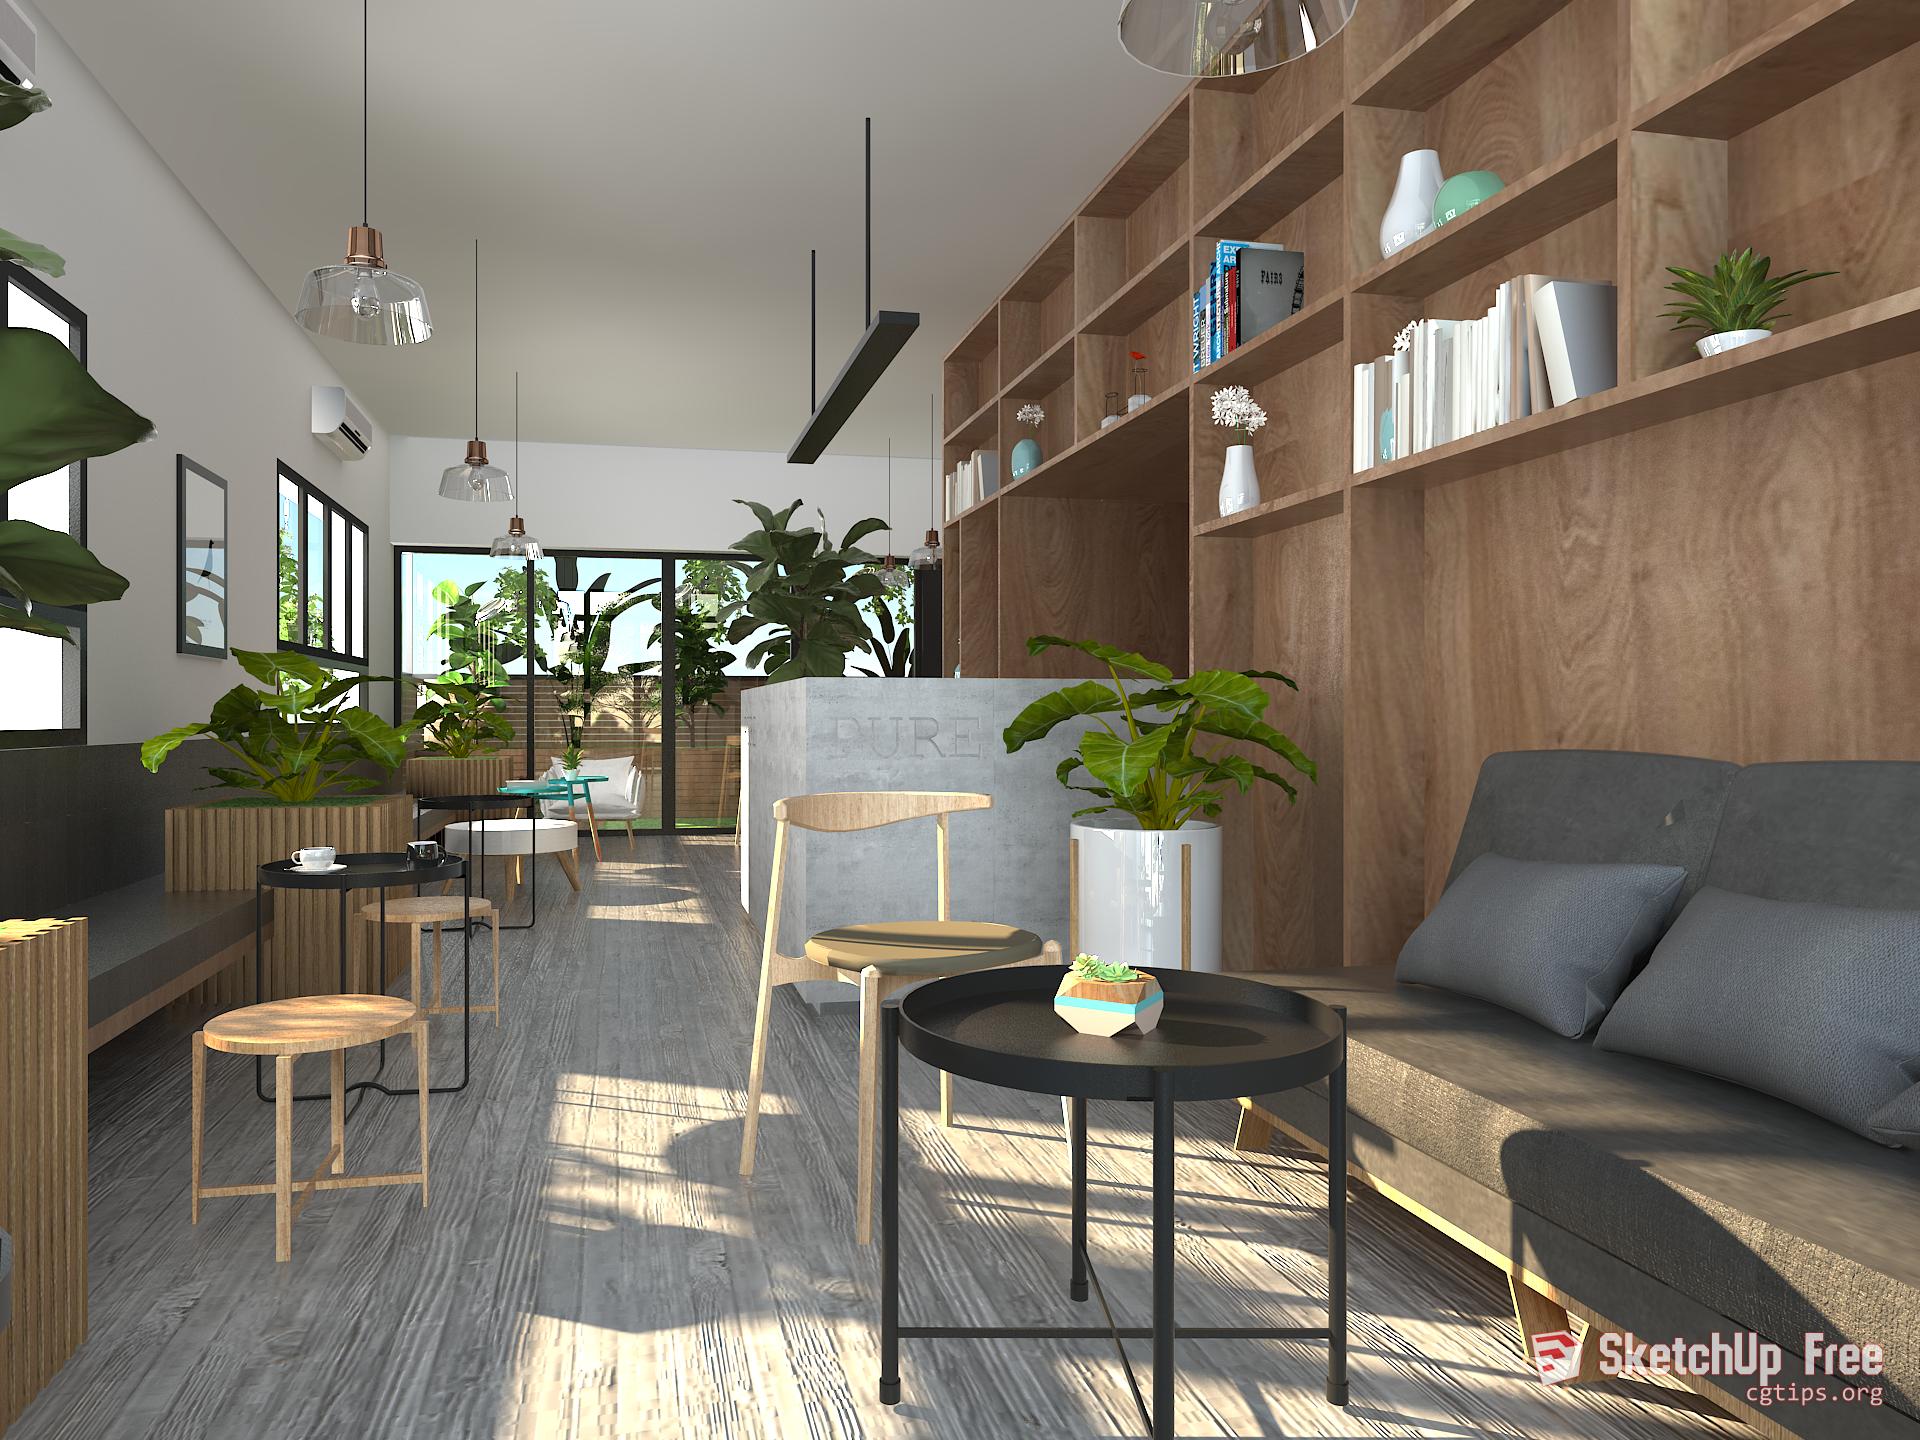 1176 Interior Cafe Showroom Scene Sketchup Model By Vu Phi